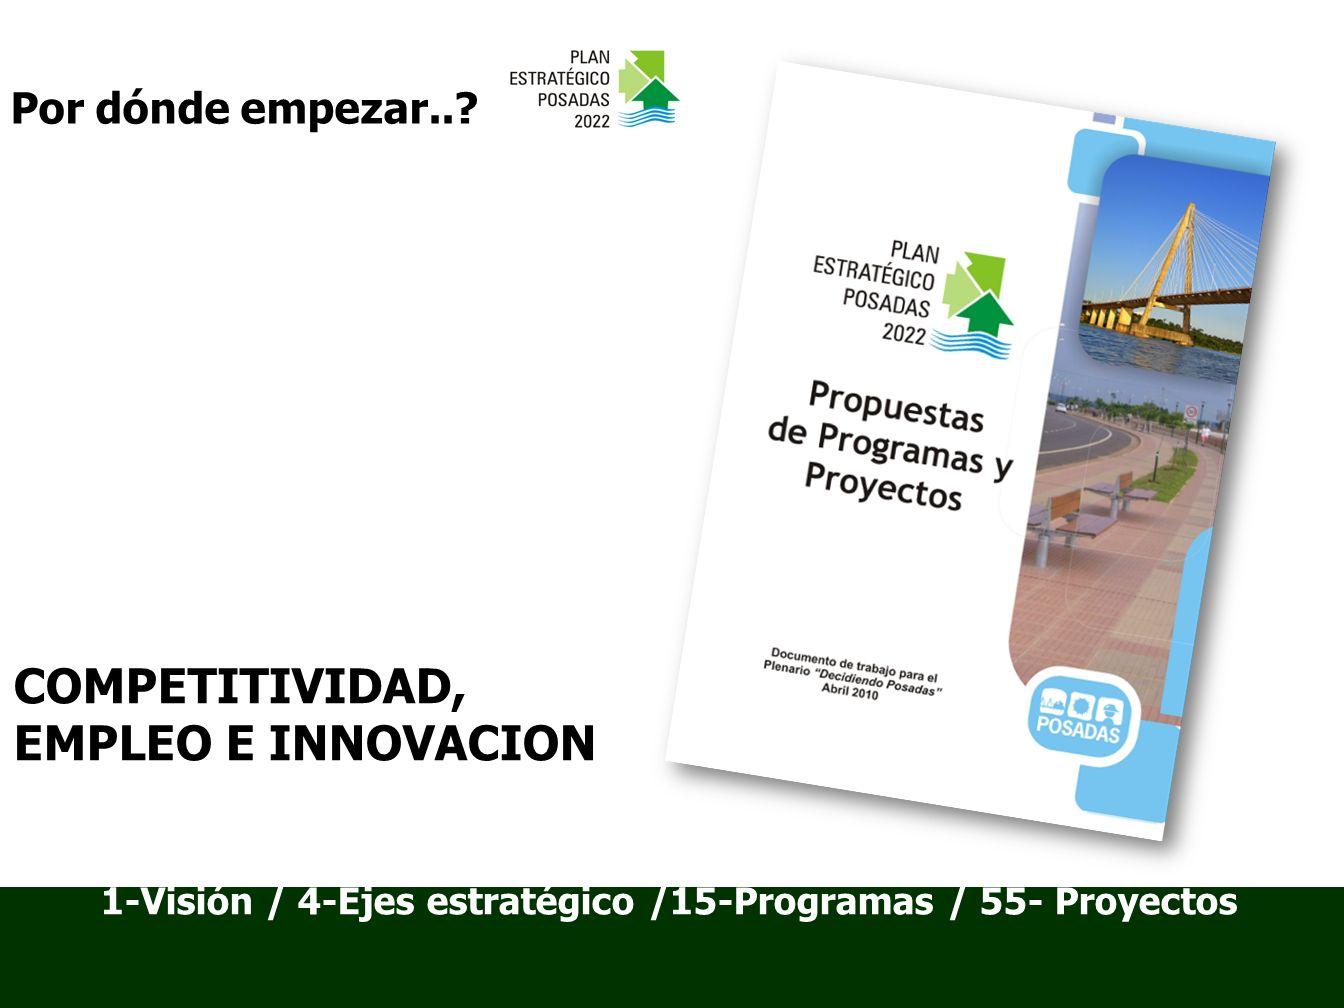 1-Visión / 4-Ejes estratégico /15-Programas / 55- Proyectos Por dónde empezar...